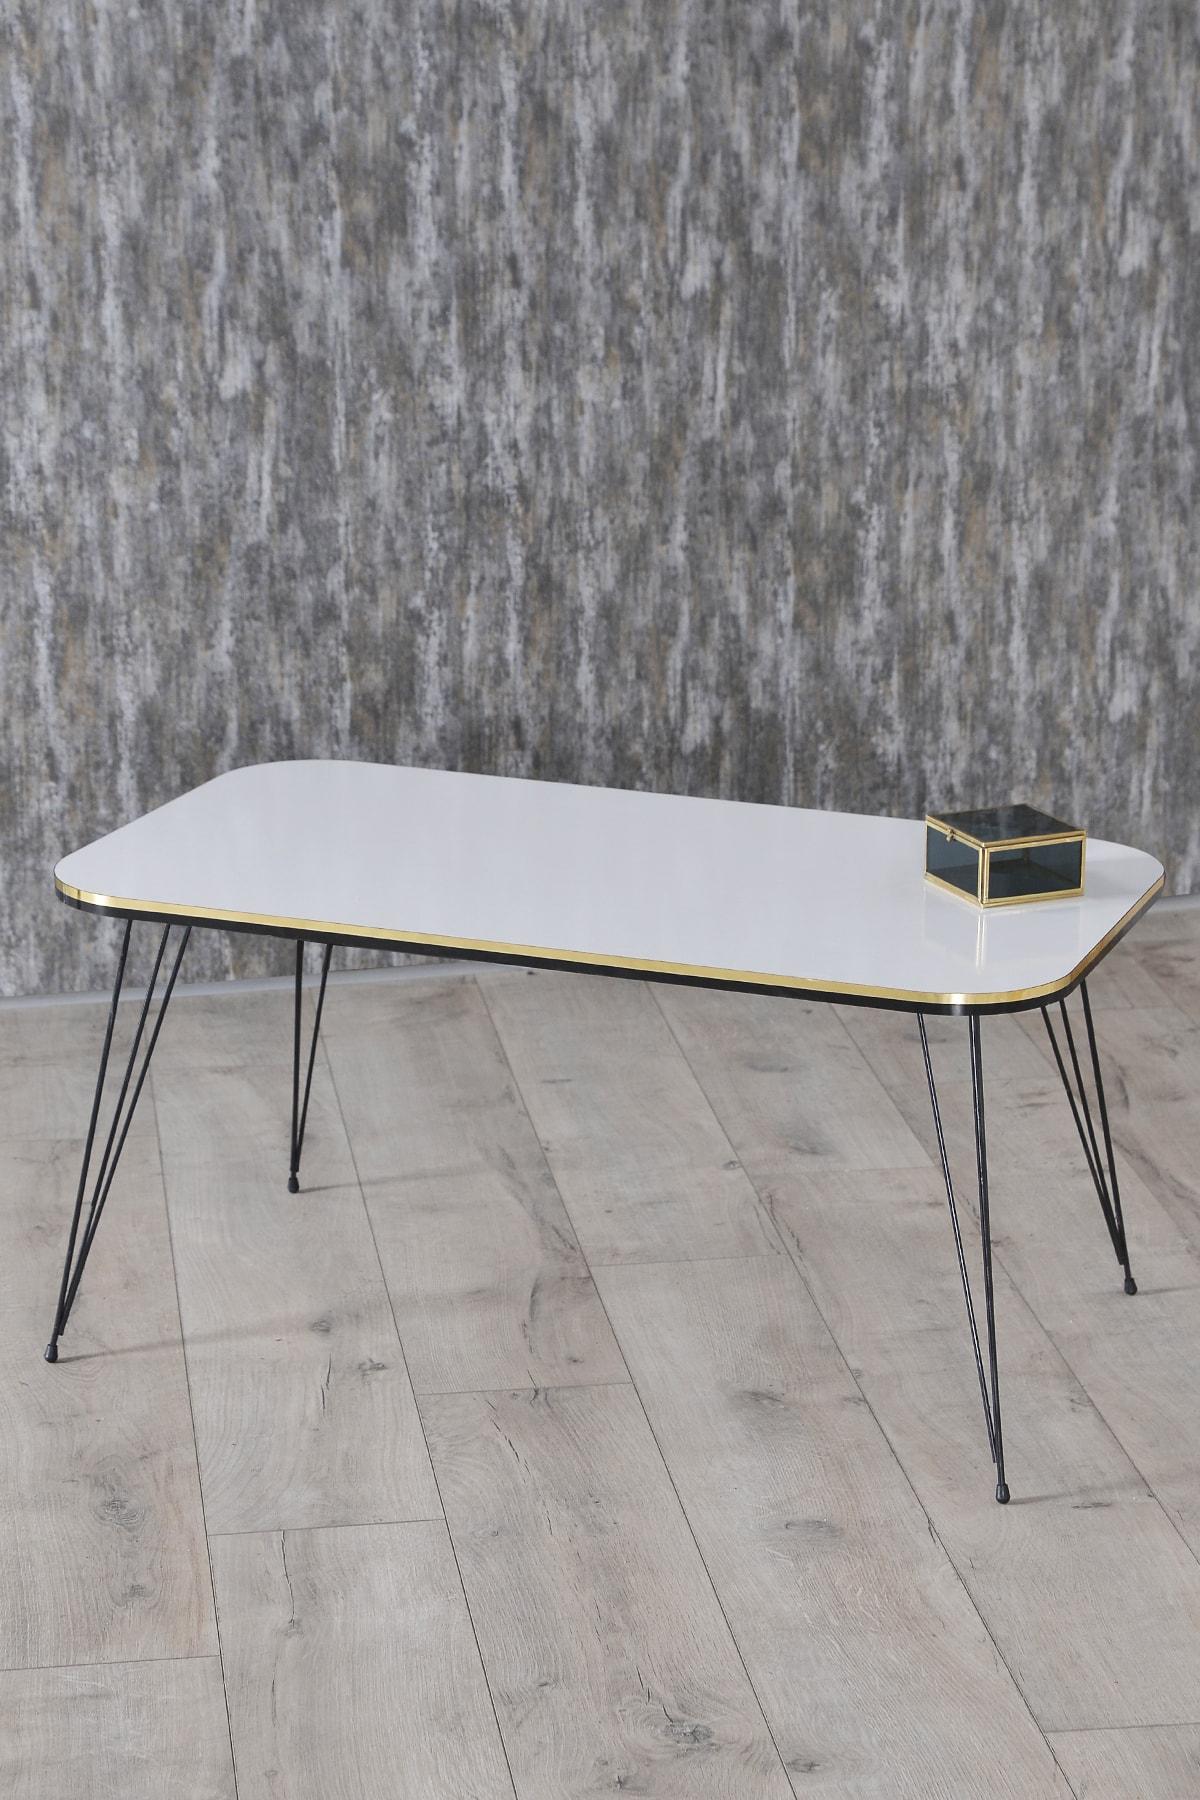 الجدول d'appoint doré скандинавский столик ميسا consola столик кофейний столик для ноутбука tische